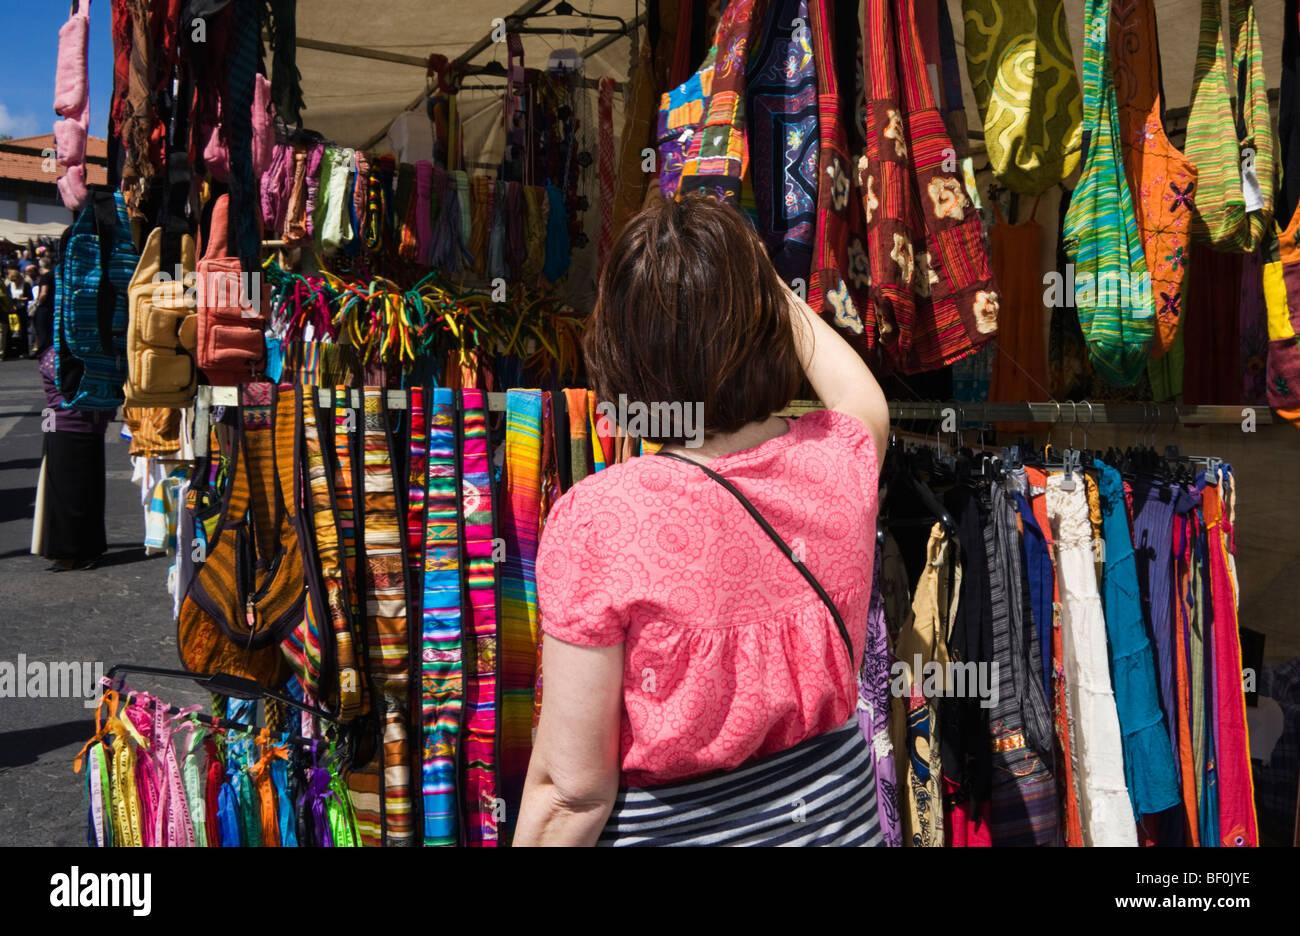 Feira da Ladra (Thieve's Market), Campo de Santa Clara, Alfama, Lisbon, Portugal, Easter 2009 - Stock Image